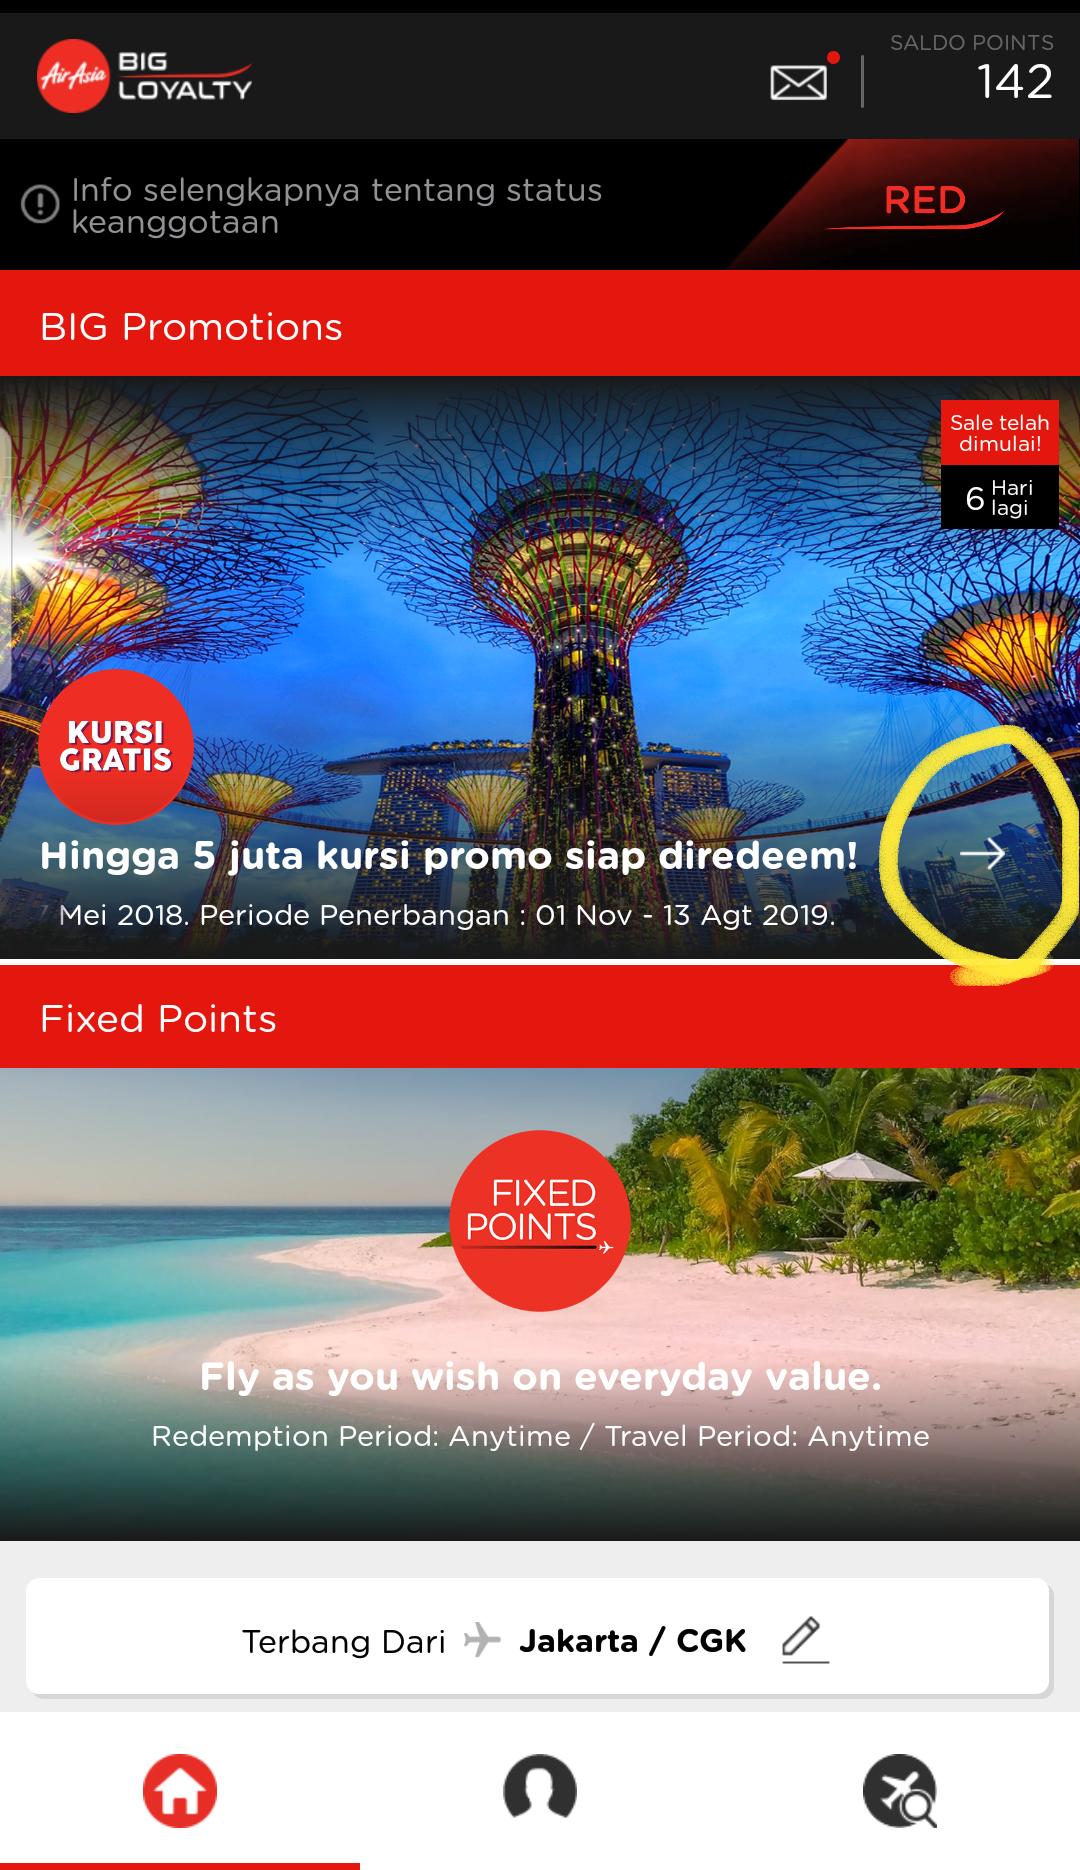 Sekedar Tips Cara Mendapatkan Kursi Gratis Air Asia Transforjim Airasia Big Poin Point Klik Di Lingkaran Kuning